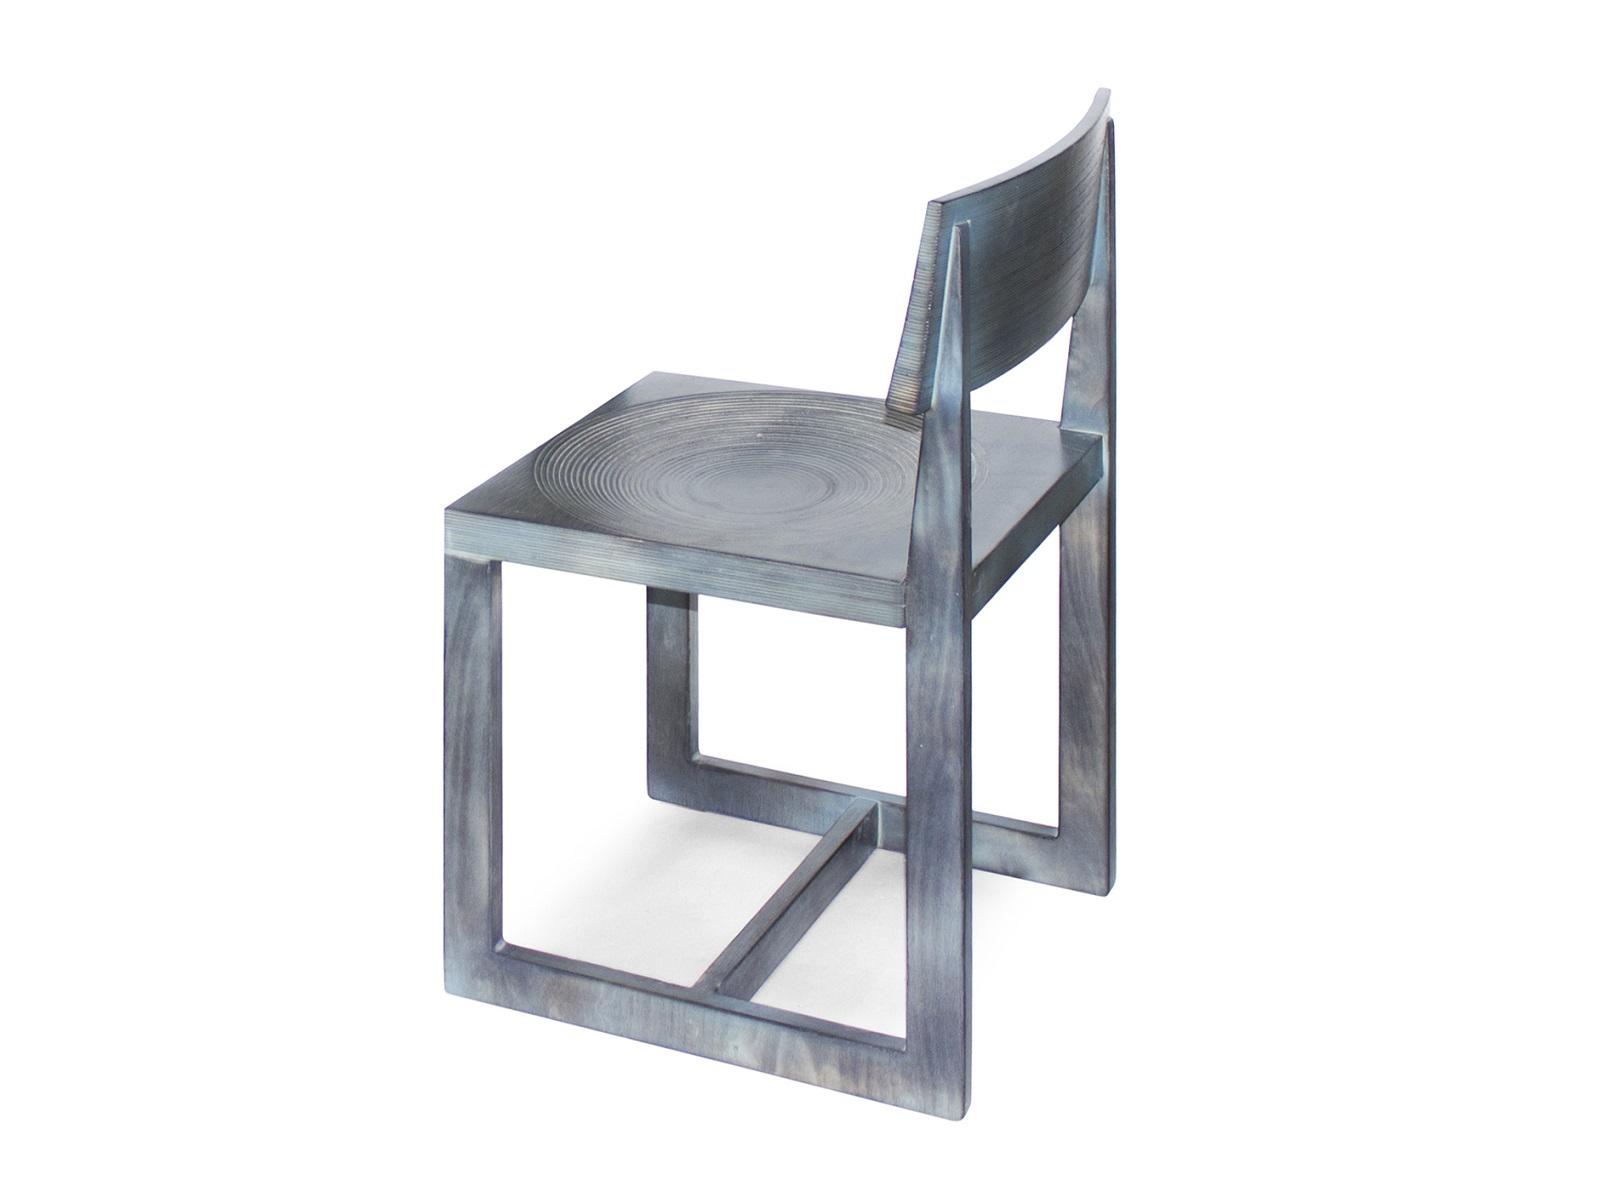 Кухонный стул Archpole 15429855 от thefurnish